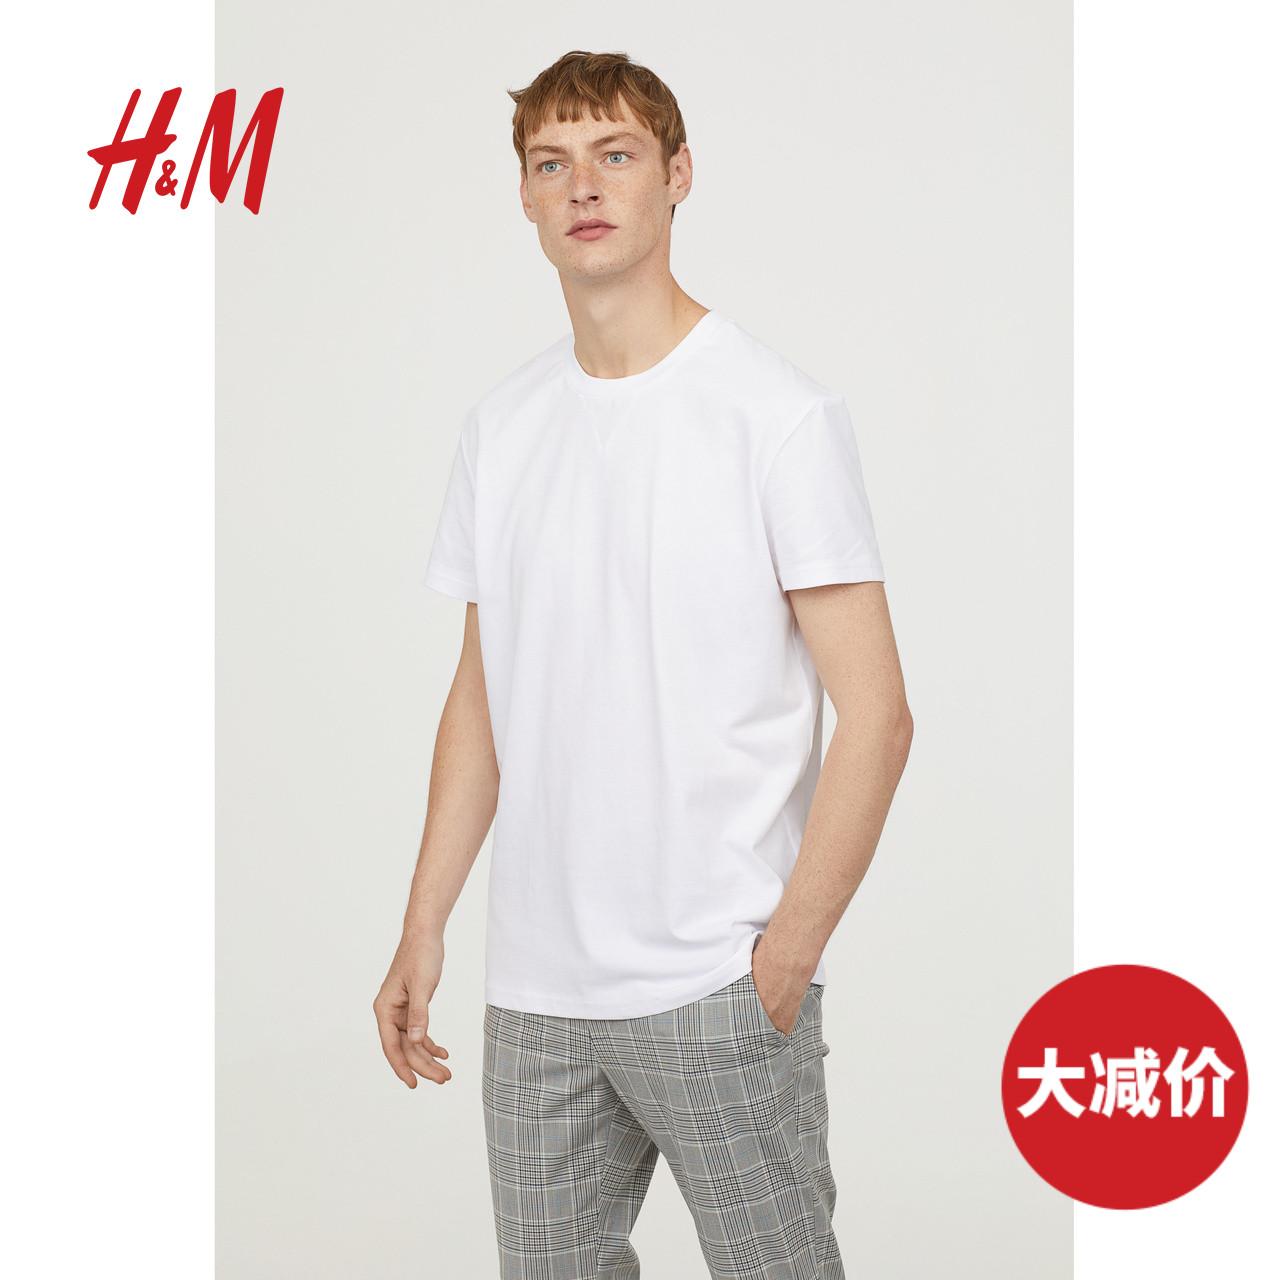 H&M男装休闲宽松T恤秋季款 棉质汗布装饰缝圆领T恤 HM0653221